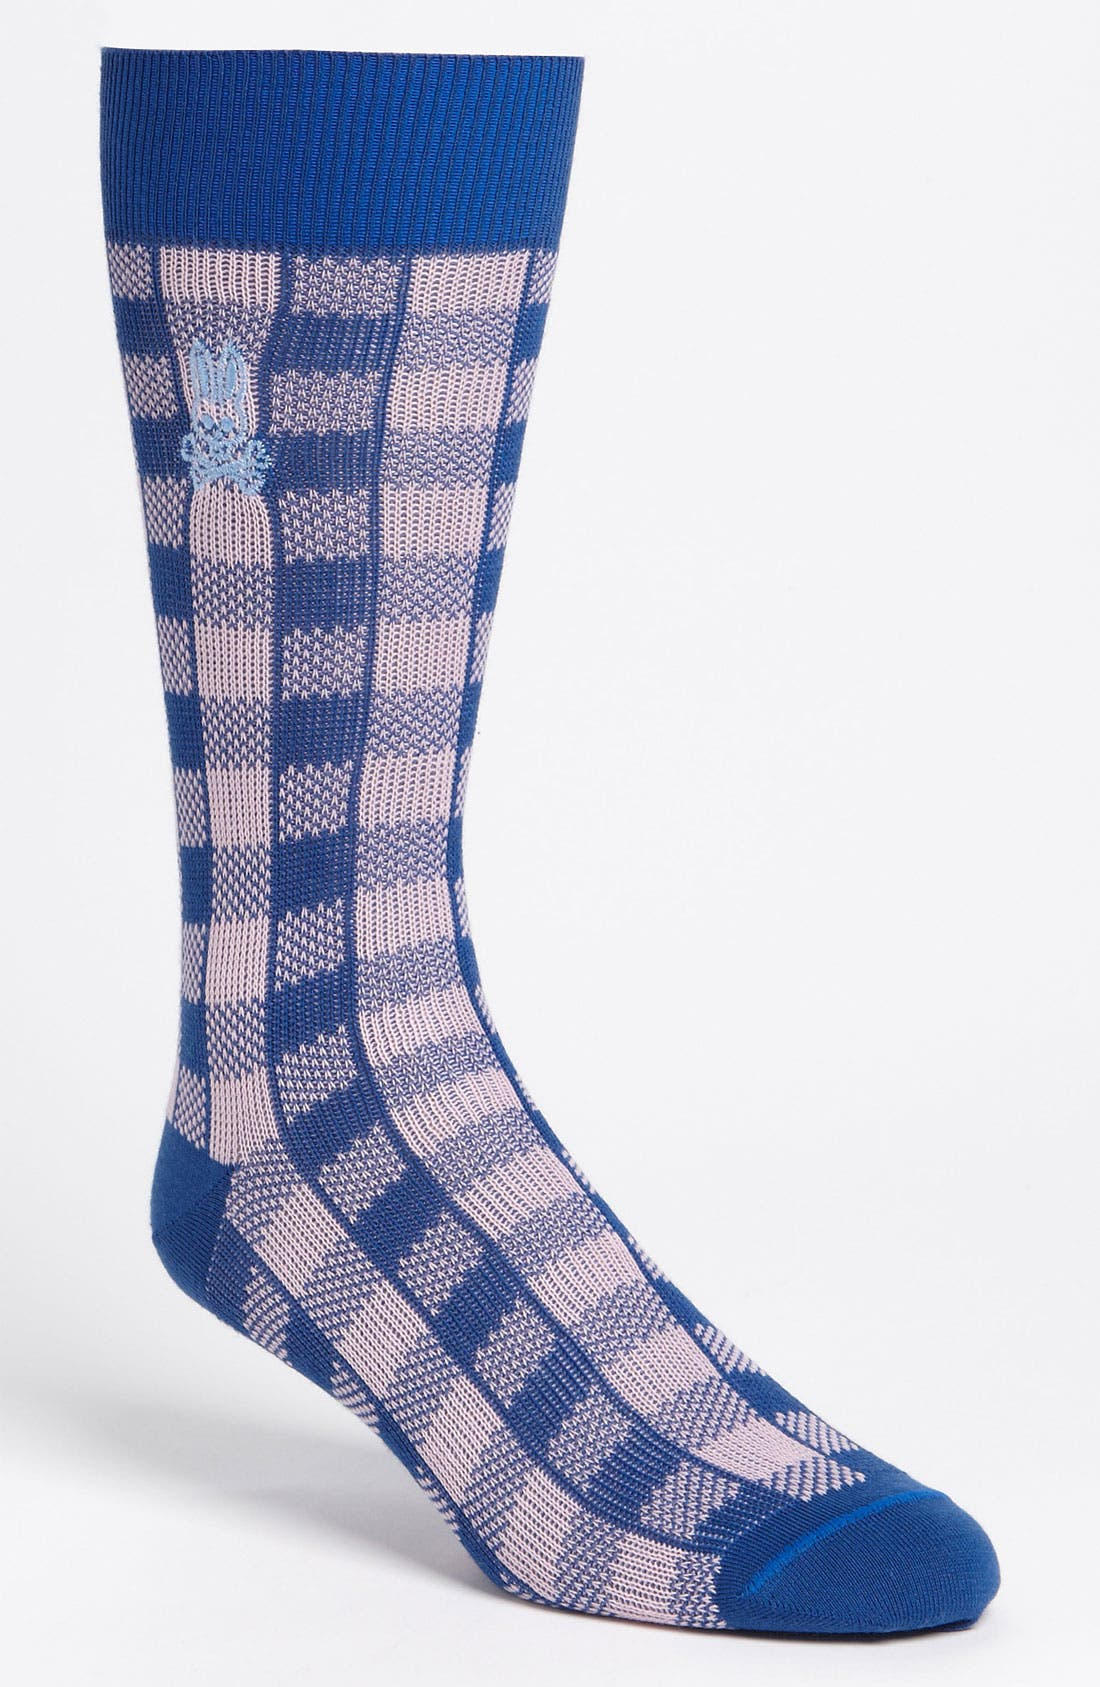 Alternate Image 1 Selected - Psycho Bunny 'Golf Check' Socks